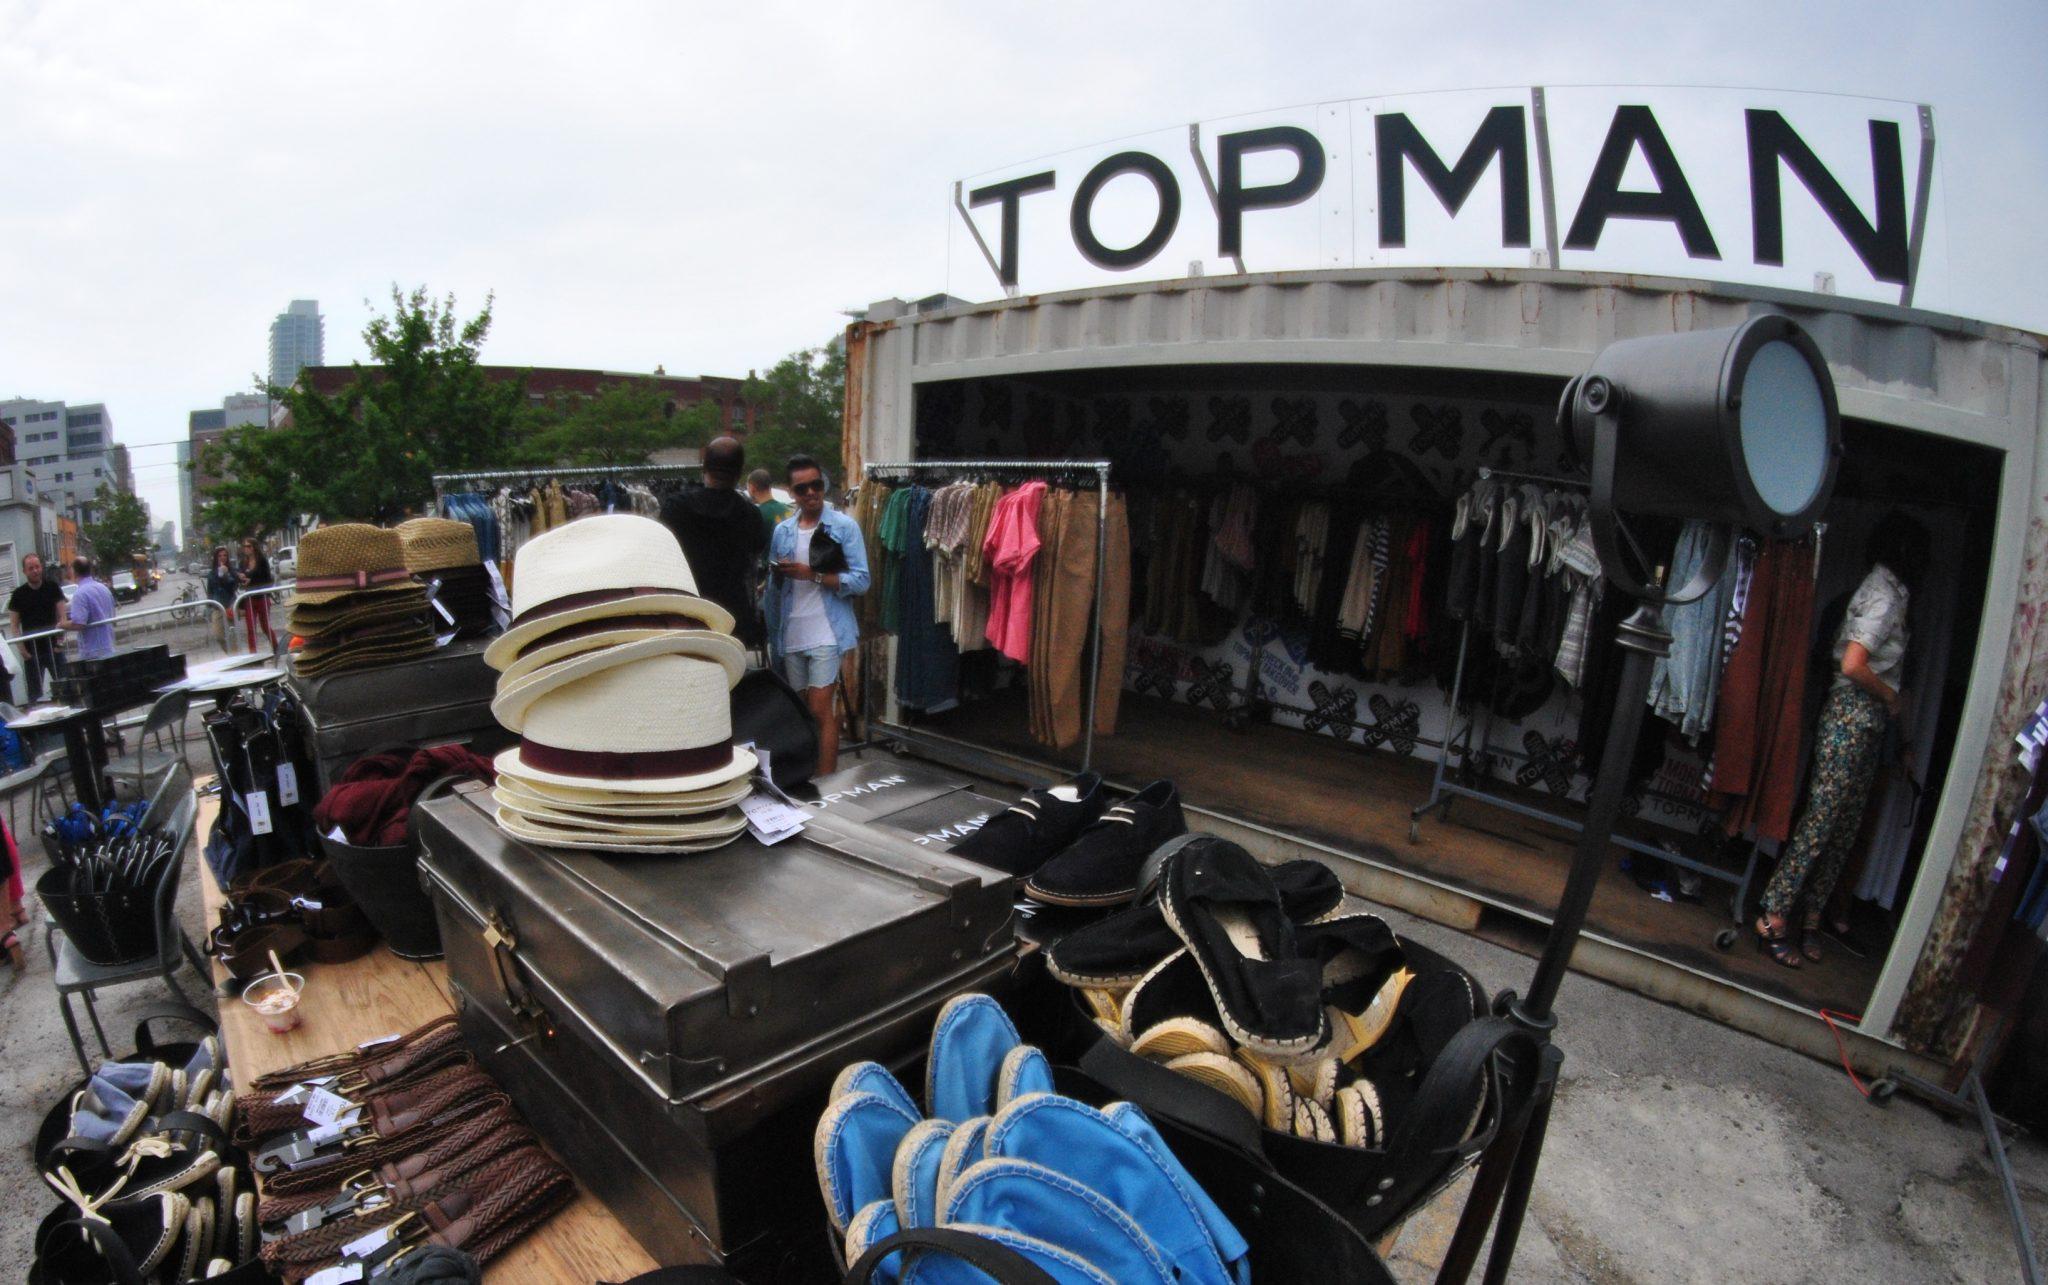 a911d8d6a06a9 Semana de moda (Londres)  Topman apresenta moda masculina para o público  jovem - Alexandre Taleb   Alexandre Taleb